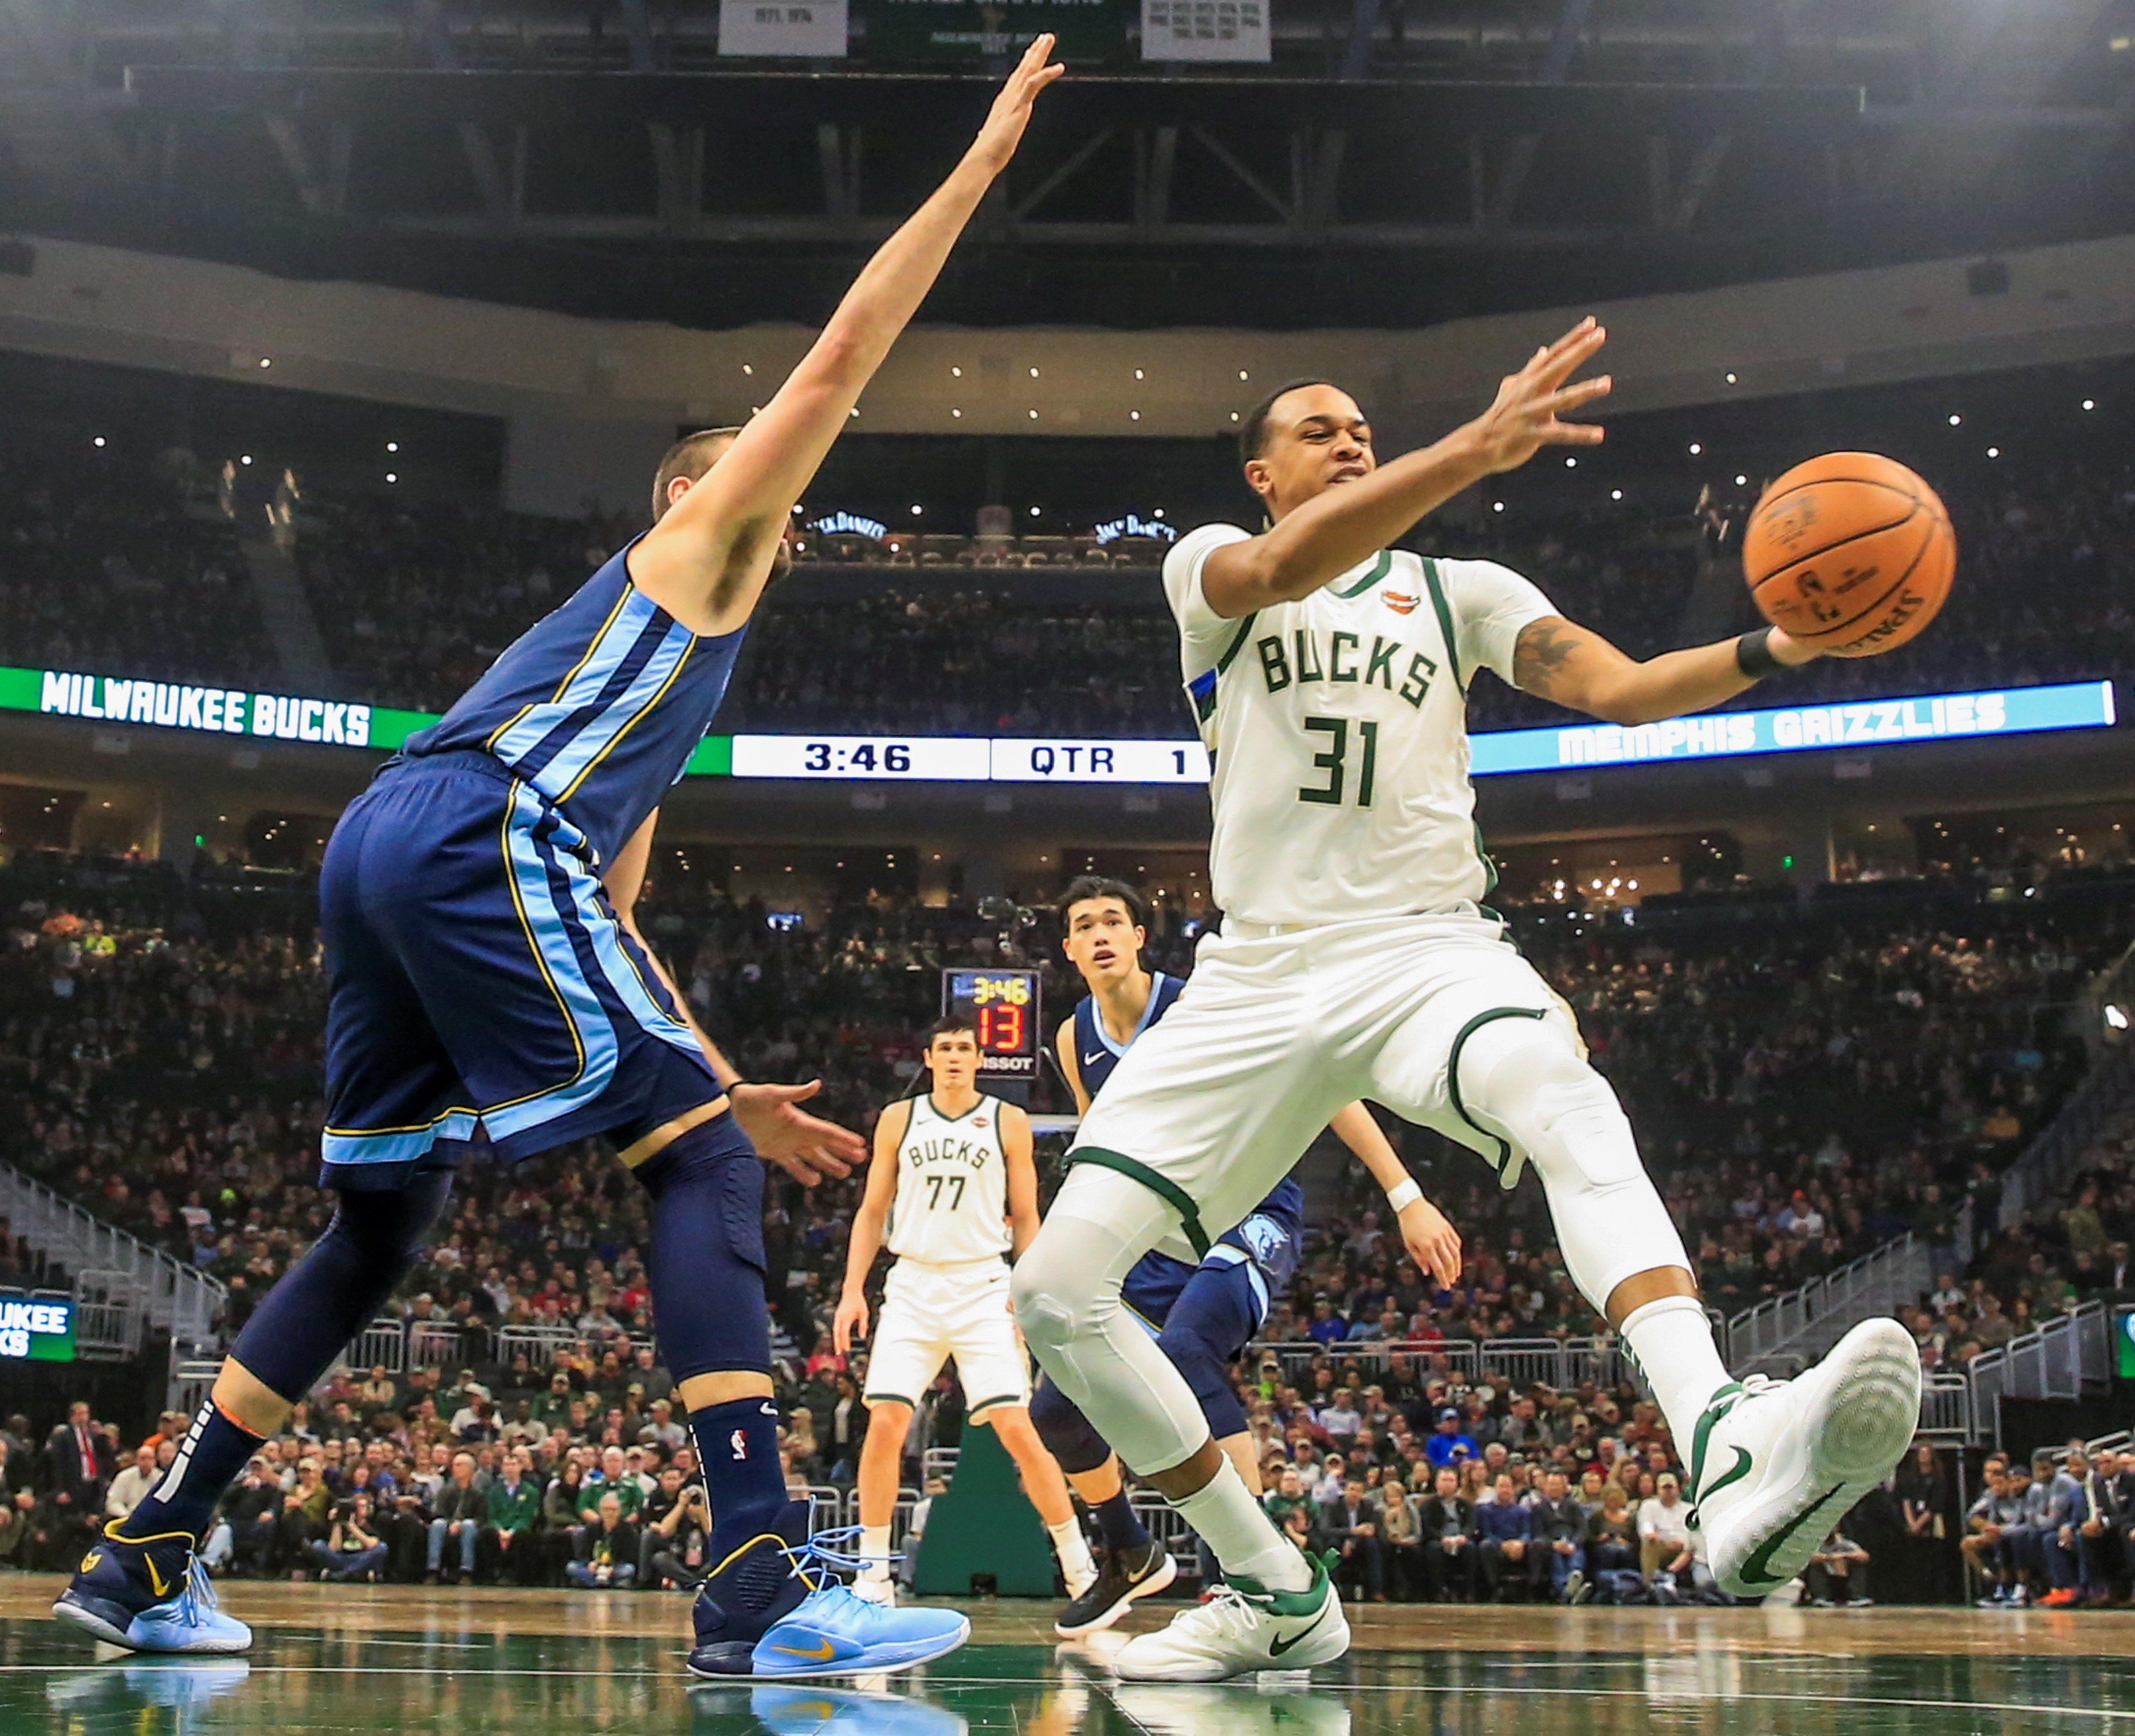 John Henson (d) de Milwaukee Bucks pierde la pelota frente a Marc Gasol (i) de Memphis Grizzlies en un partido de la NBA entre Memphis Grizzlies y Milwaukee Bucks en Fiserv Forum en Milwaukee (EE.UU.). EFE